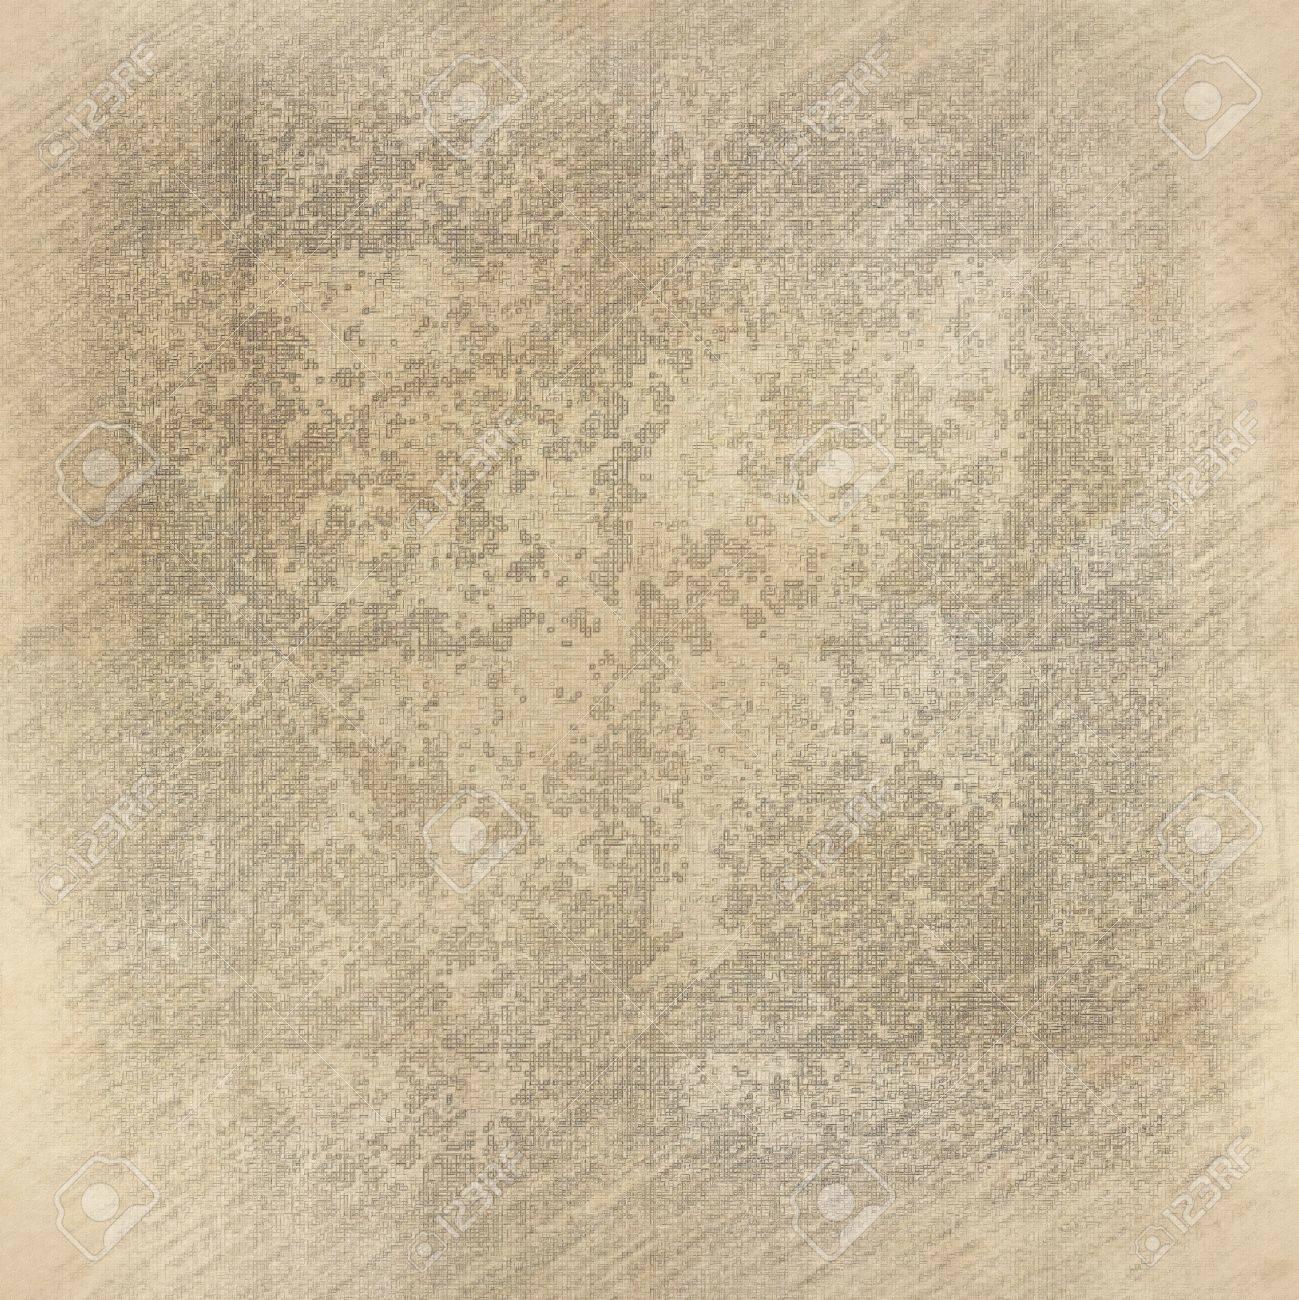 papel pintado envejecido envoltura shabby antiguo mosaico sin fisuras papel de textura de fondo